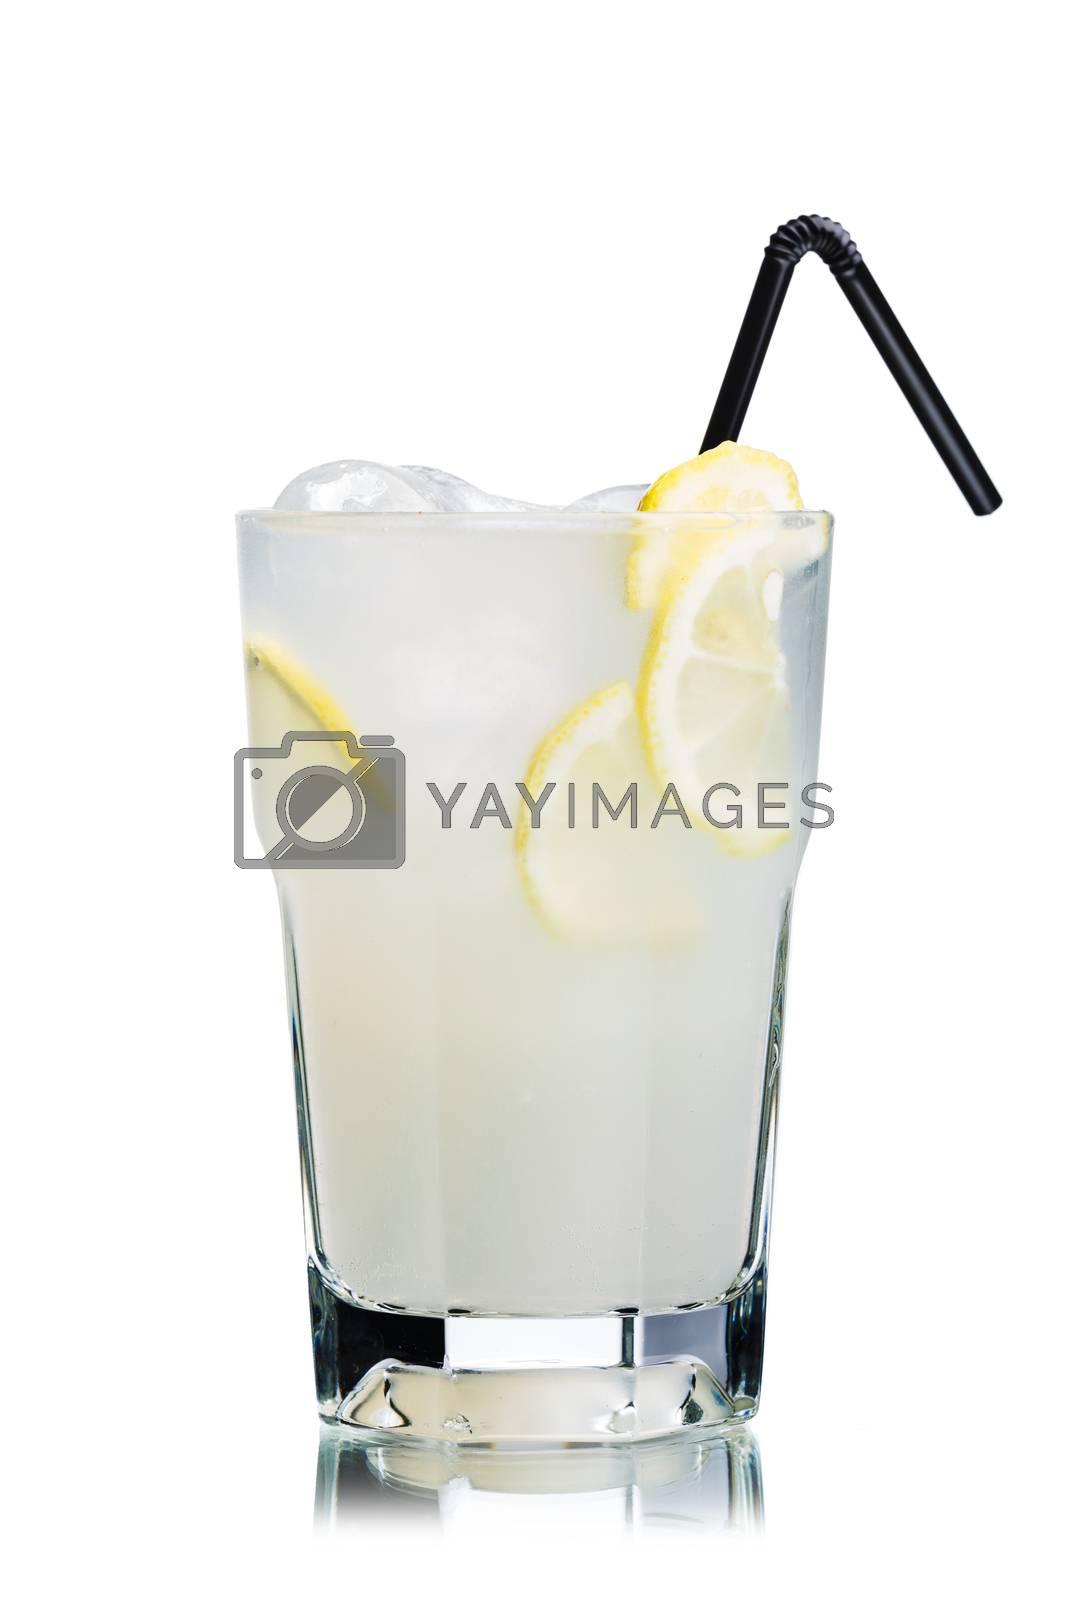 Royalty free image of Lemonade by maxsol